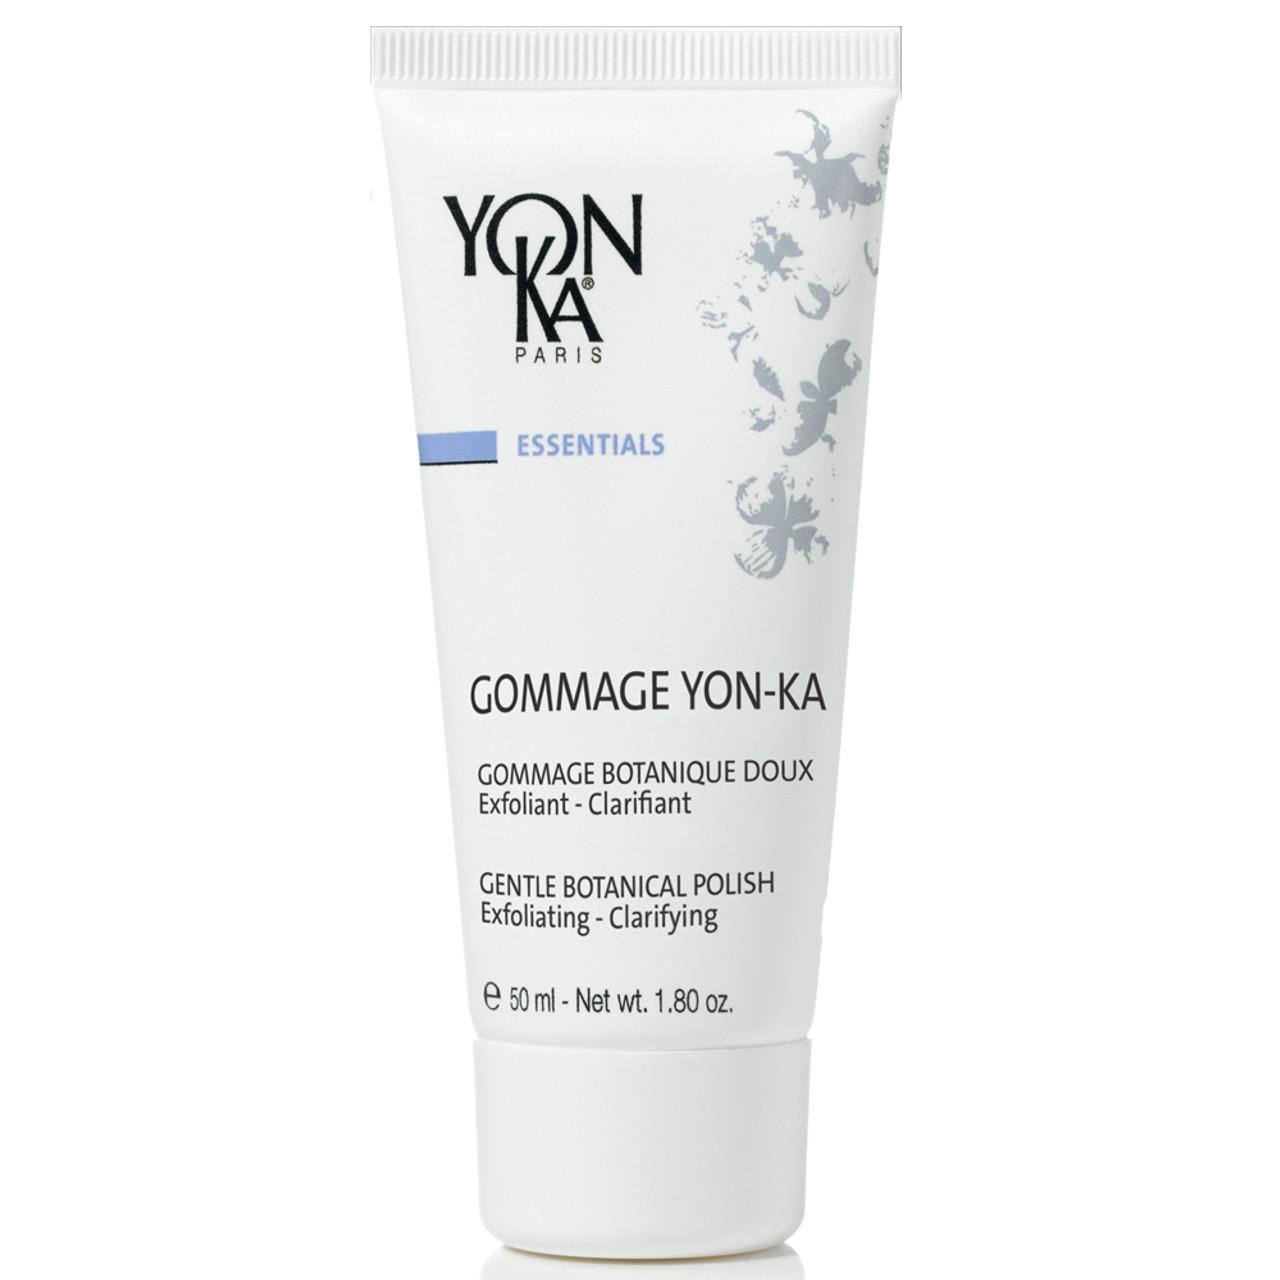 Yonka Gommage Yon-Ka Gentle Botanical Polish BeautifiedYou.com